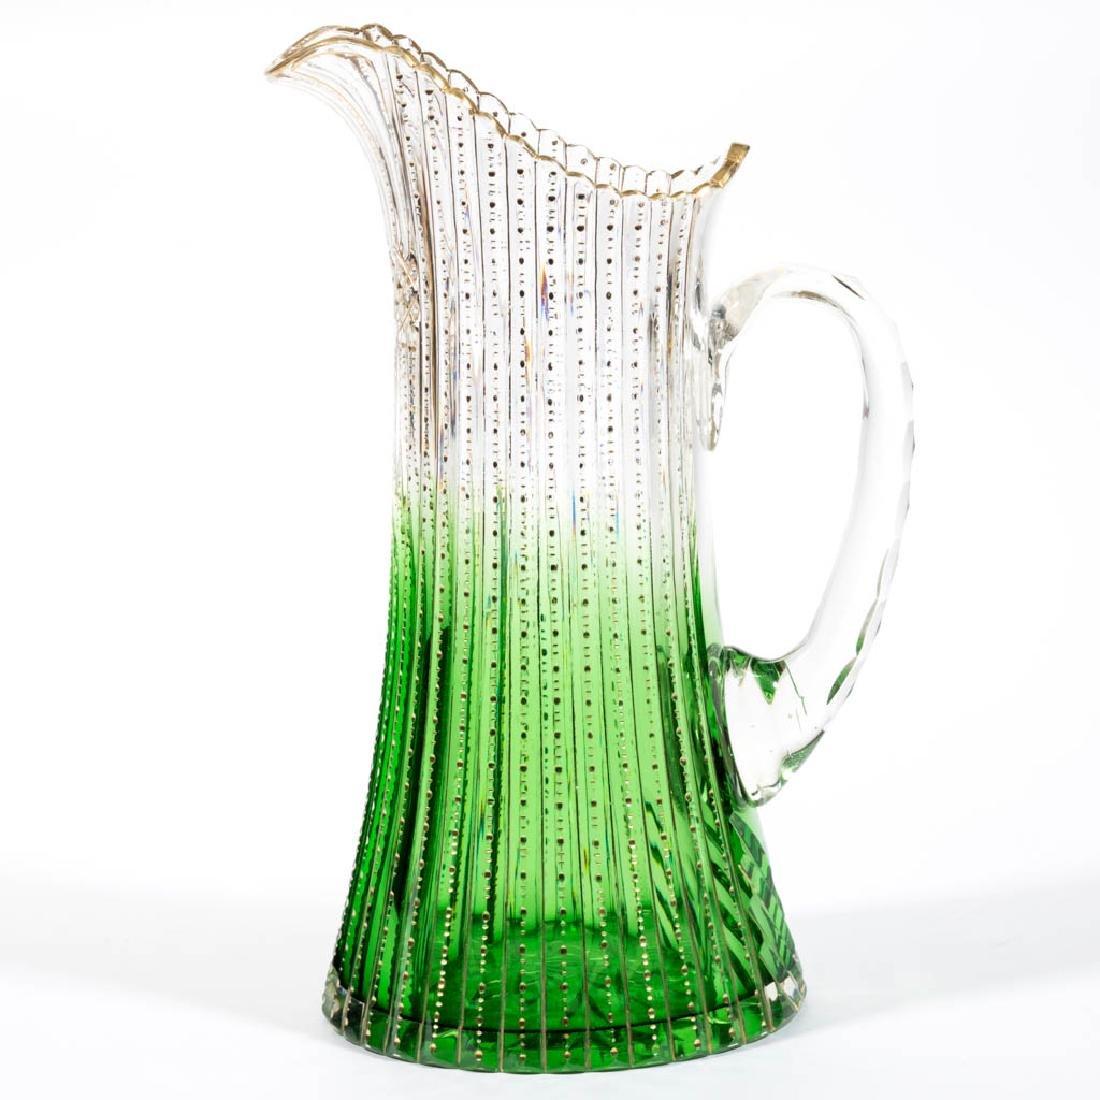 SHADED GREEN ZIPPERED CUT GLASS PITCHER